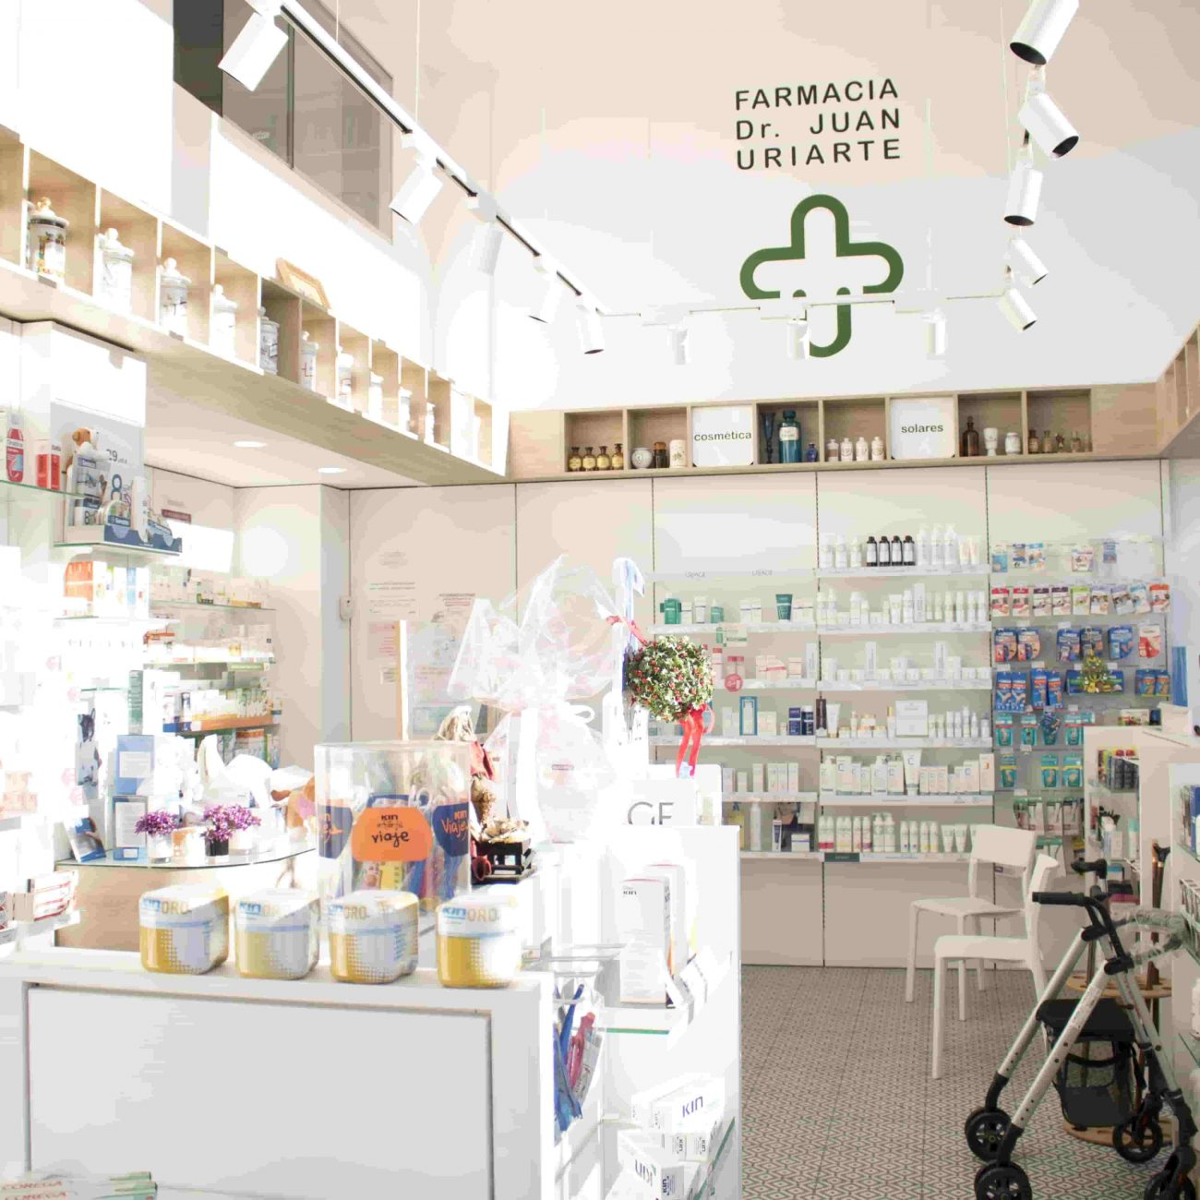 Farmacia Juan Uriarte Garcia-Borreguero en San Ignacio